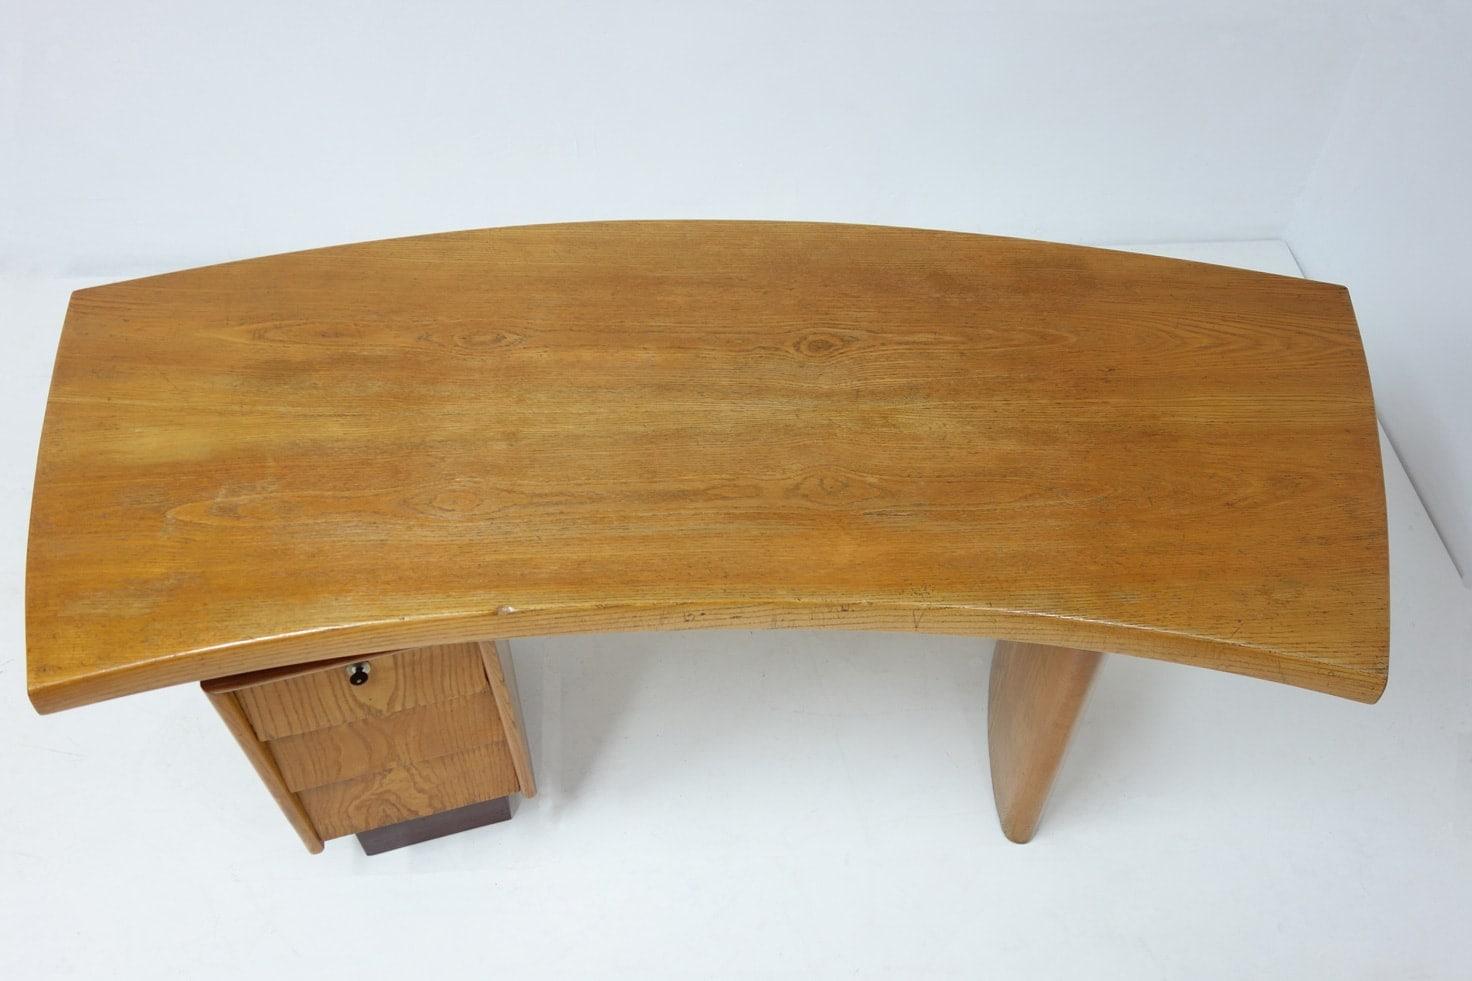 Charlotte Perriand & Pierre Jeanneret, Desk N°9, vue 04